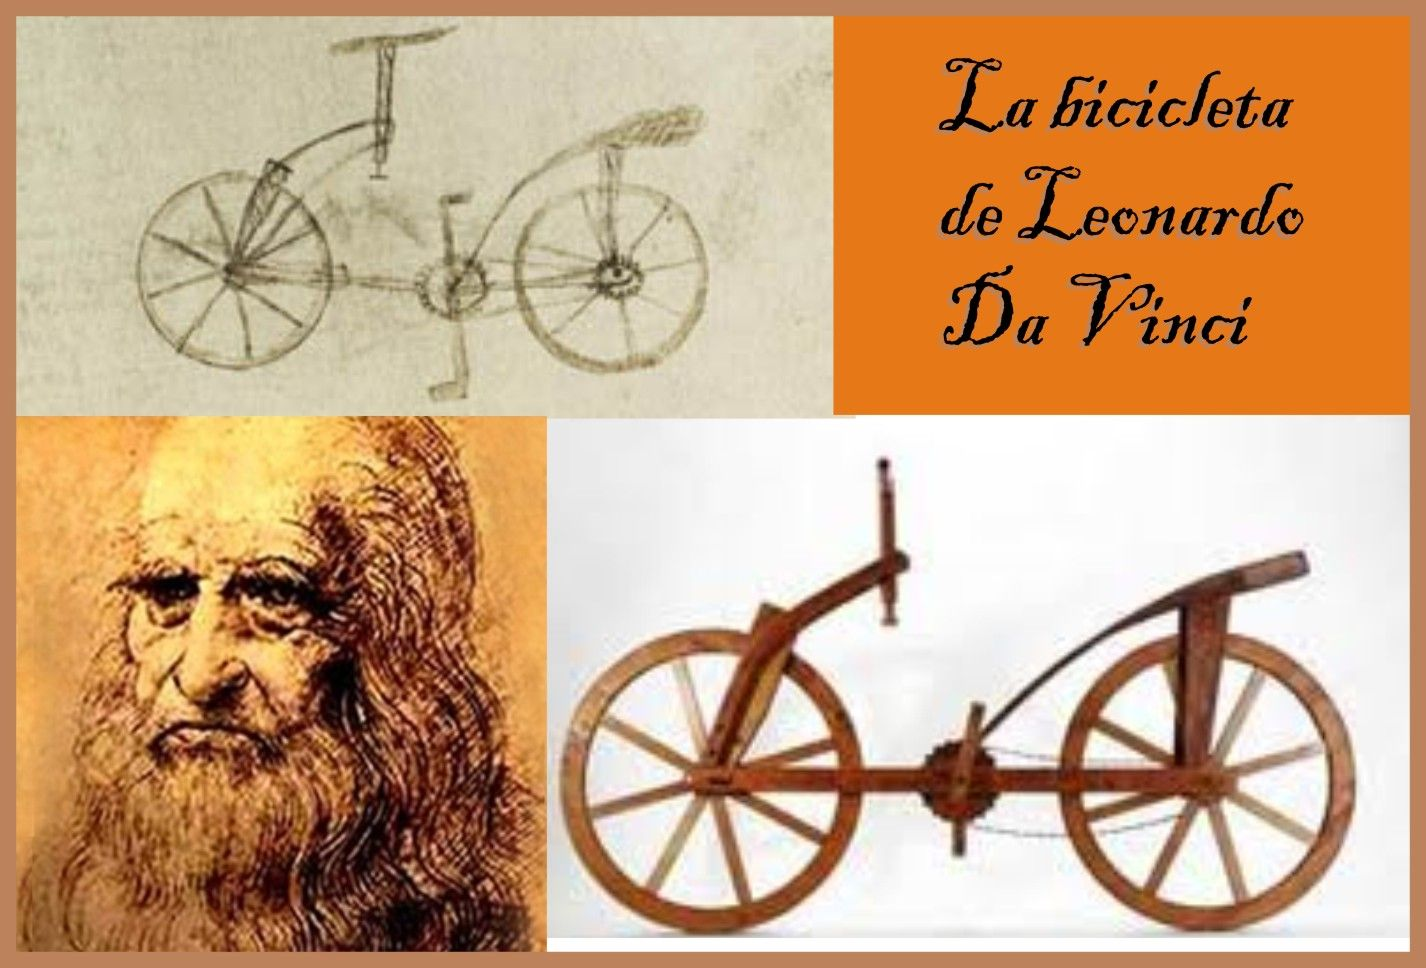 Leonardo Da Vinci 1452 1519 Pero Simplemente Leonardo Vinci Nombre Del Lugar De Donde Provení Leonardo Da Vinci Leonardo Da Vinci Renacimiento Bicicletas